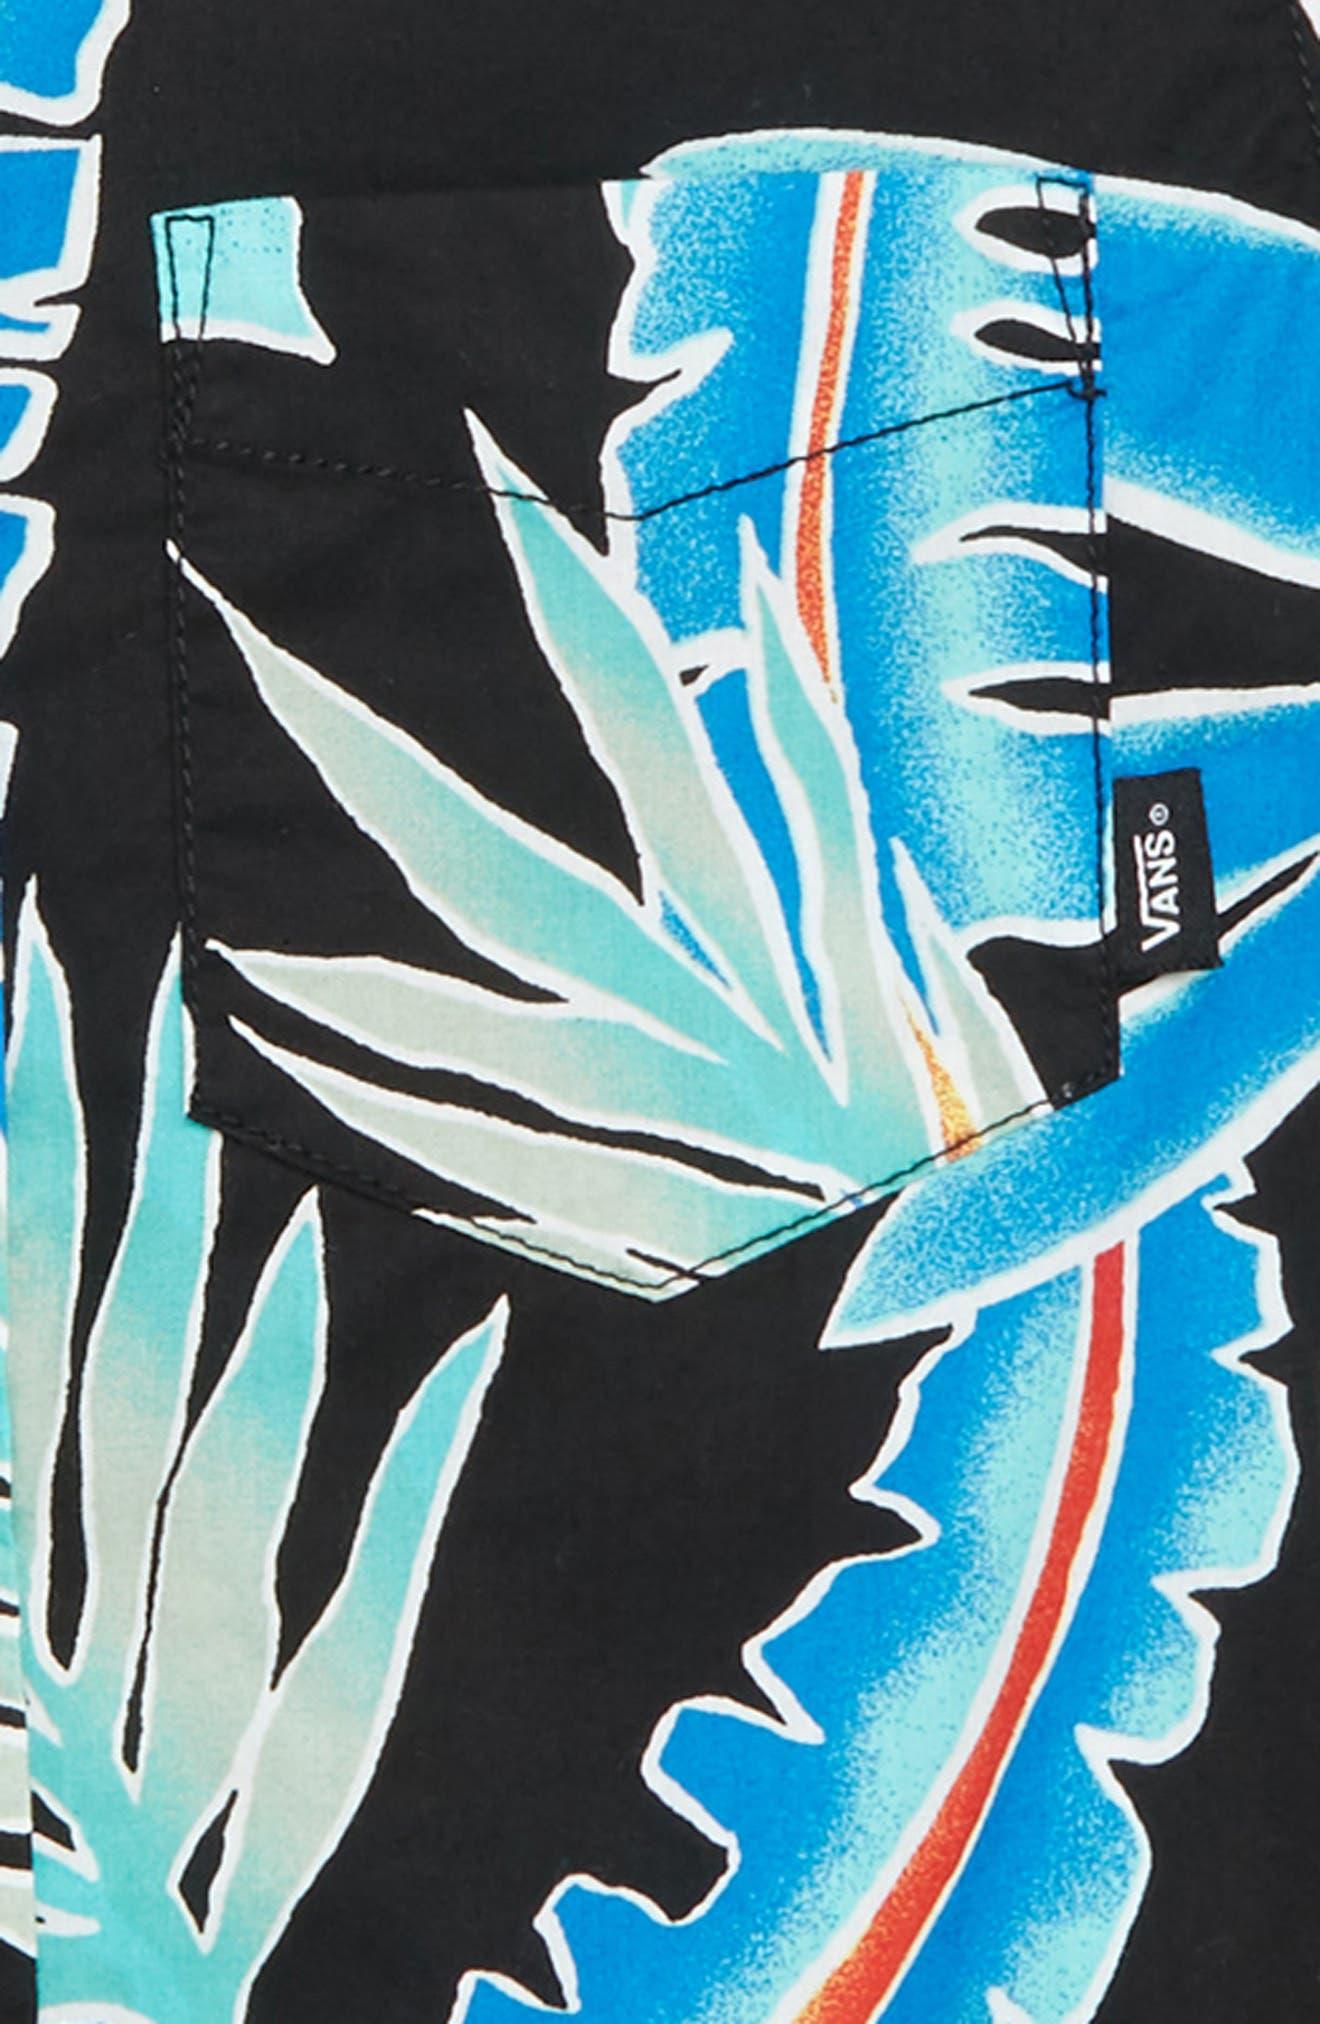 Tropical Floral Woven Shirt,                             Alternate thumbnail 2, color,                             001